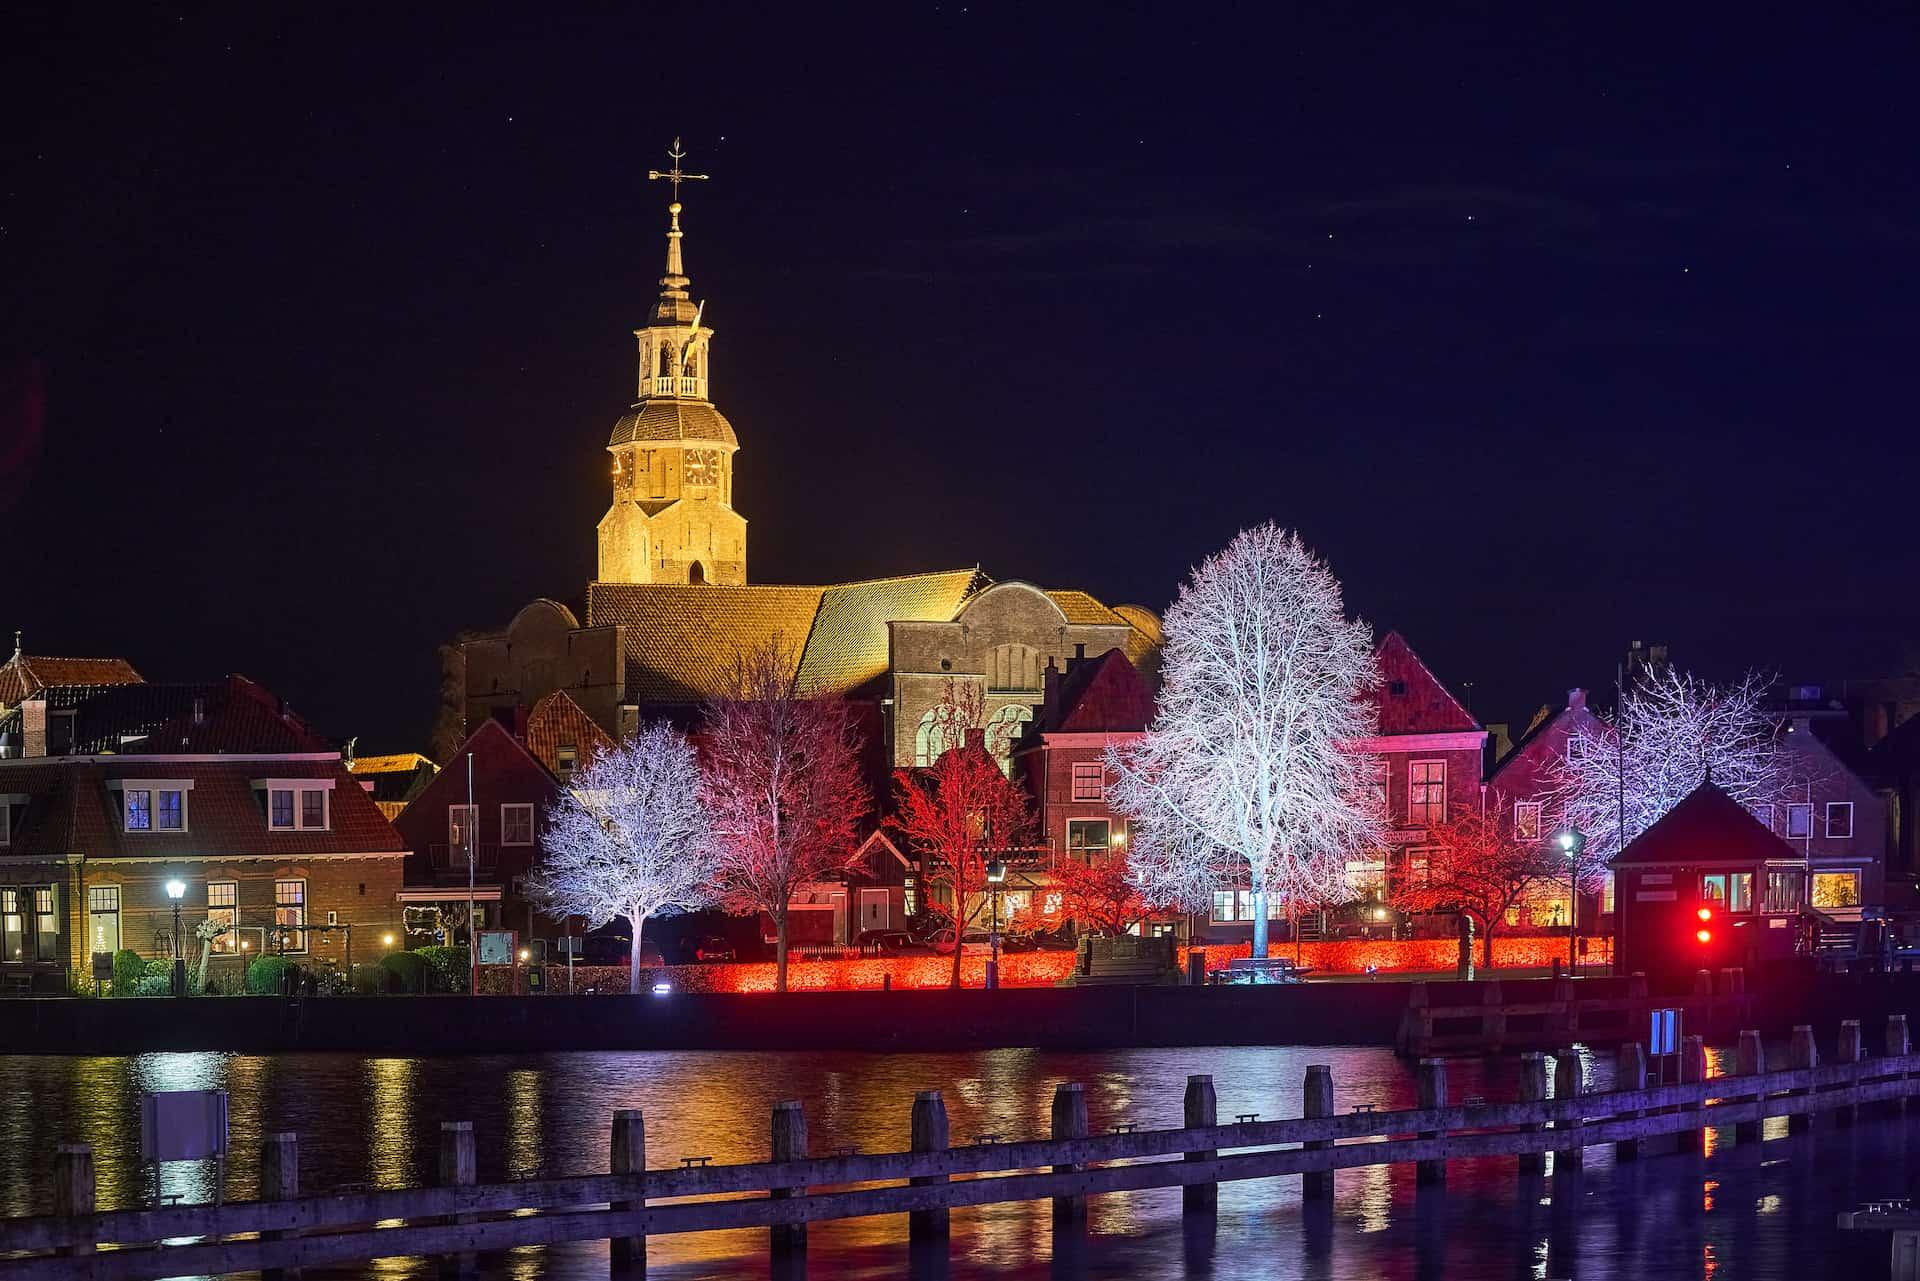 Lights in Blokzijl